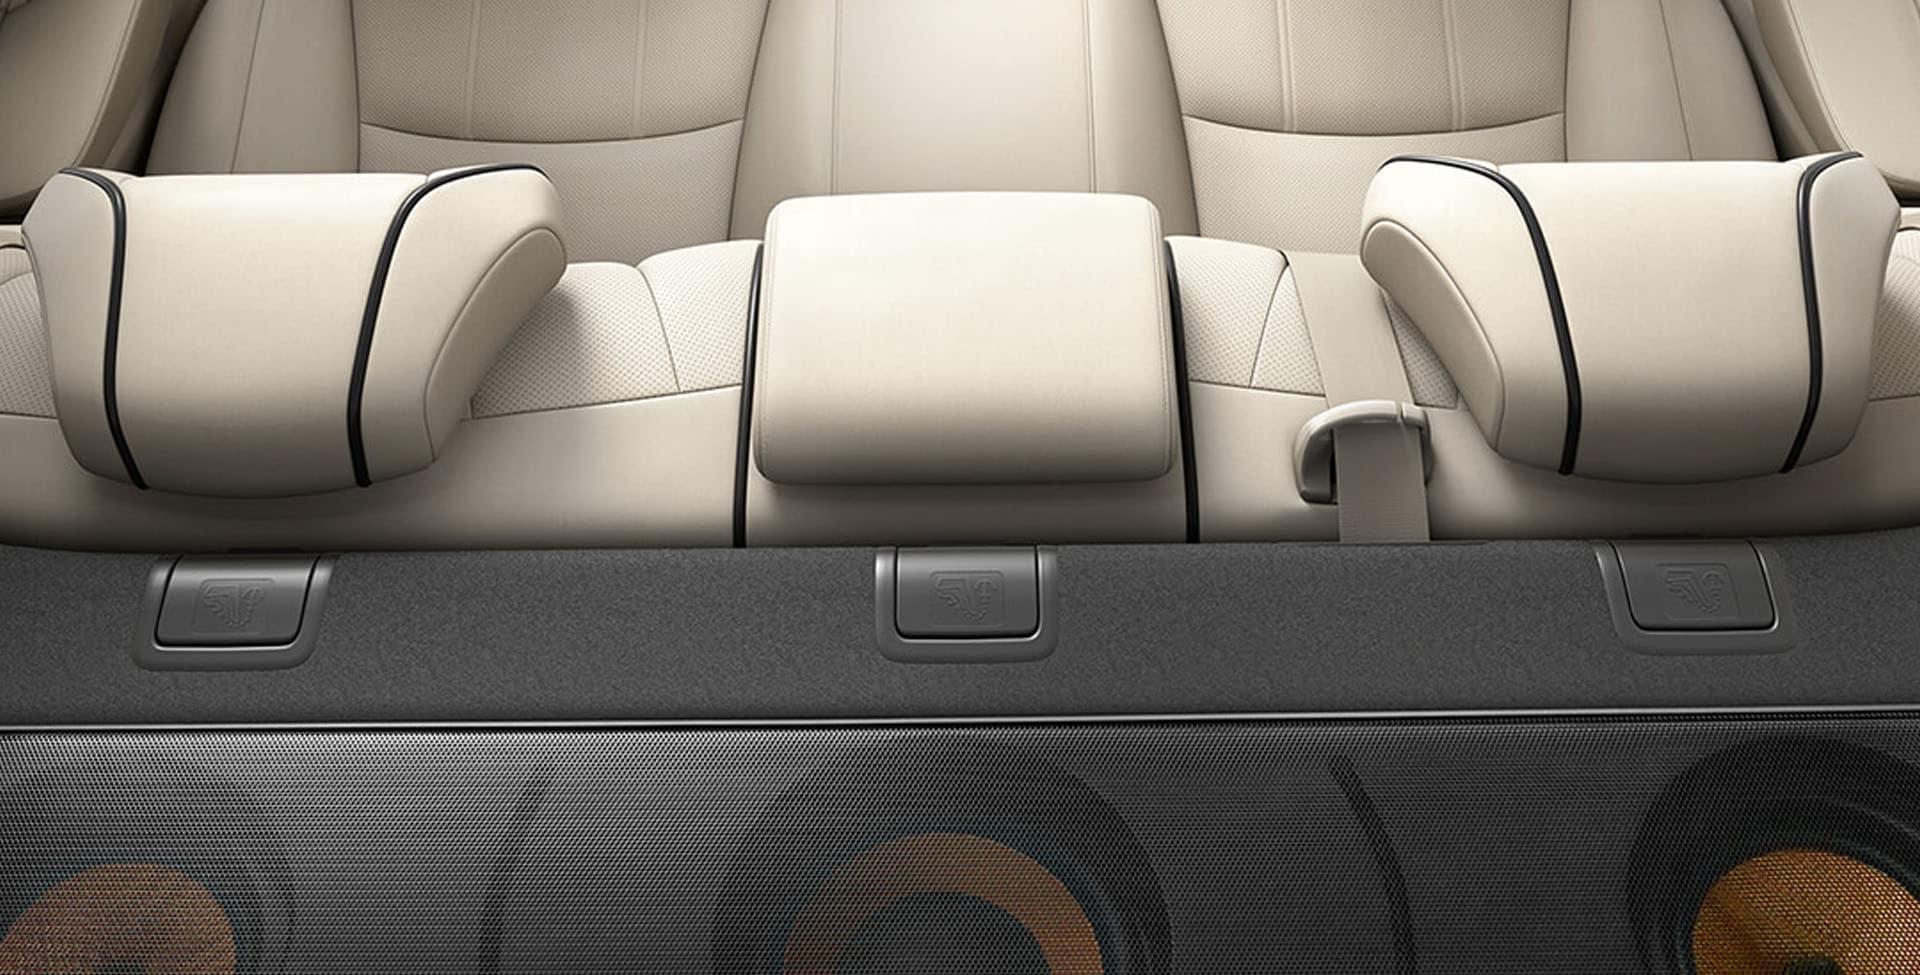 Acura RLX speaker